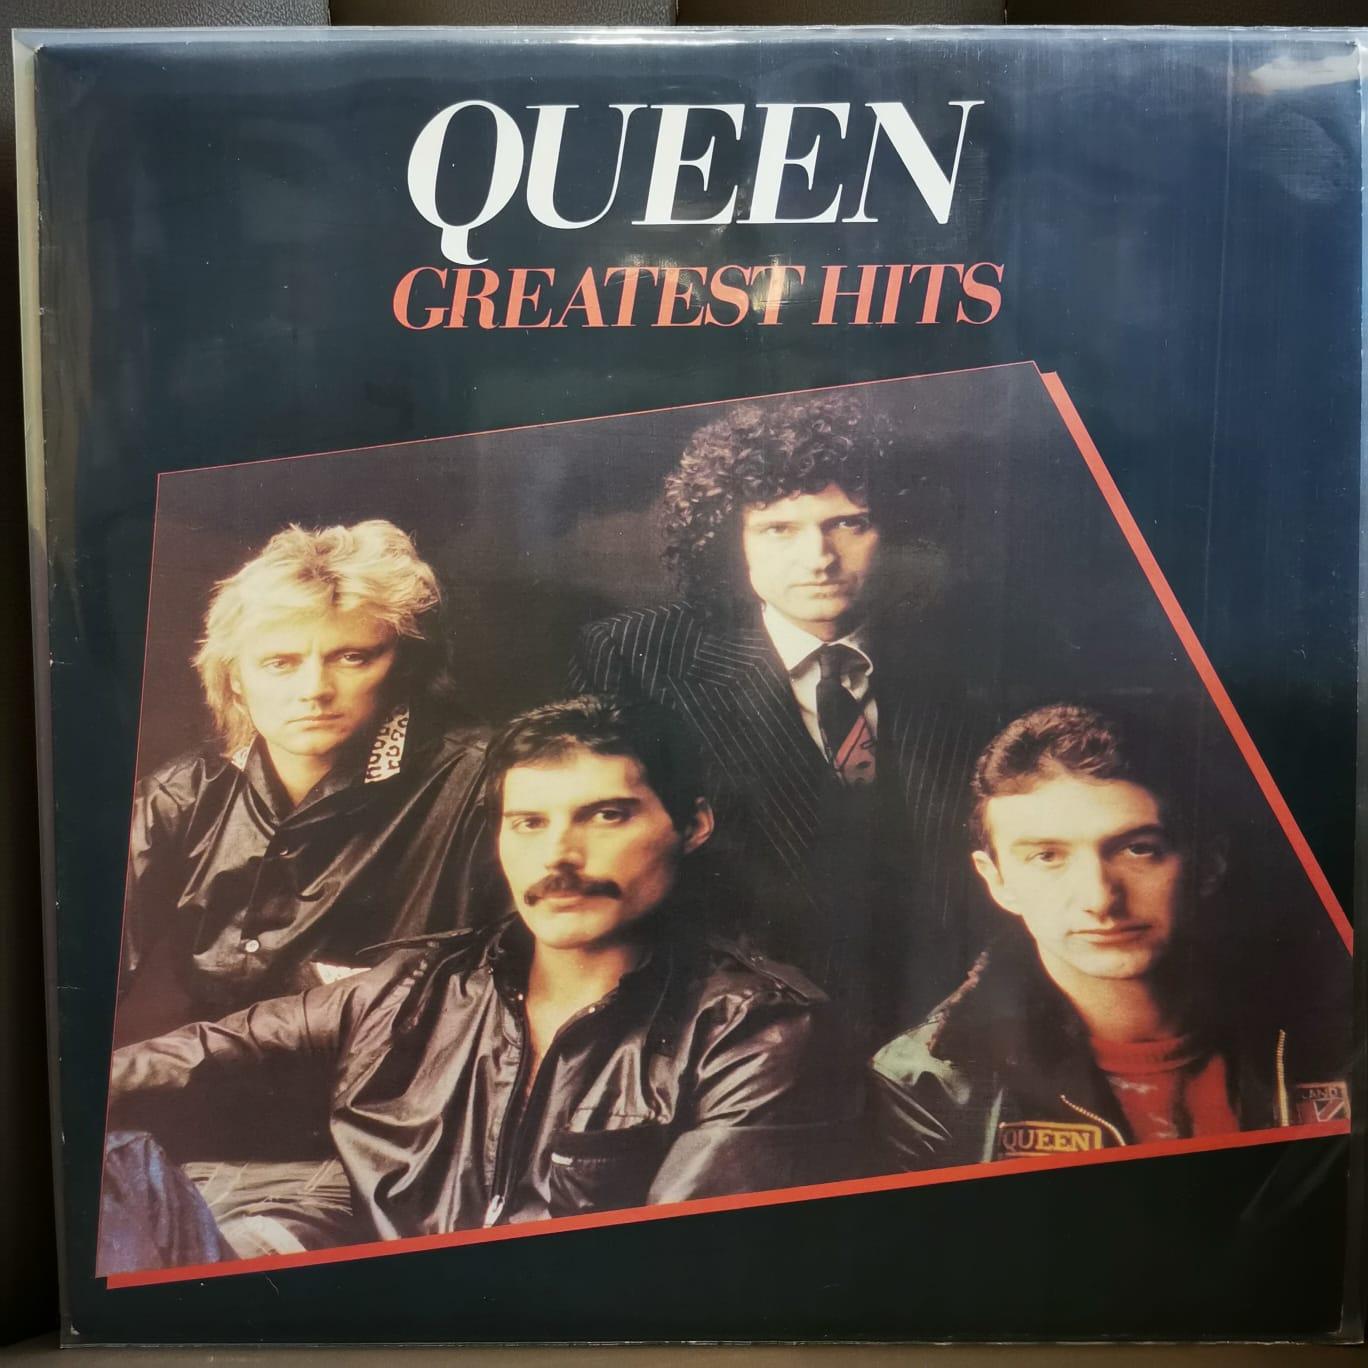 QUEEN - GREATEST HITS - Vinyl, LP, Compilation, Reissue, Repress - PLAK